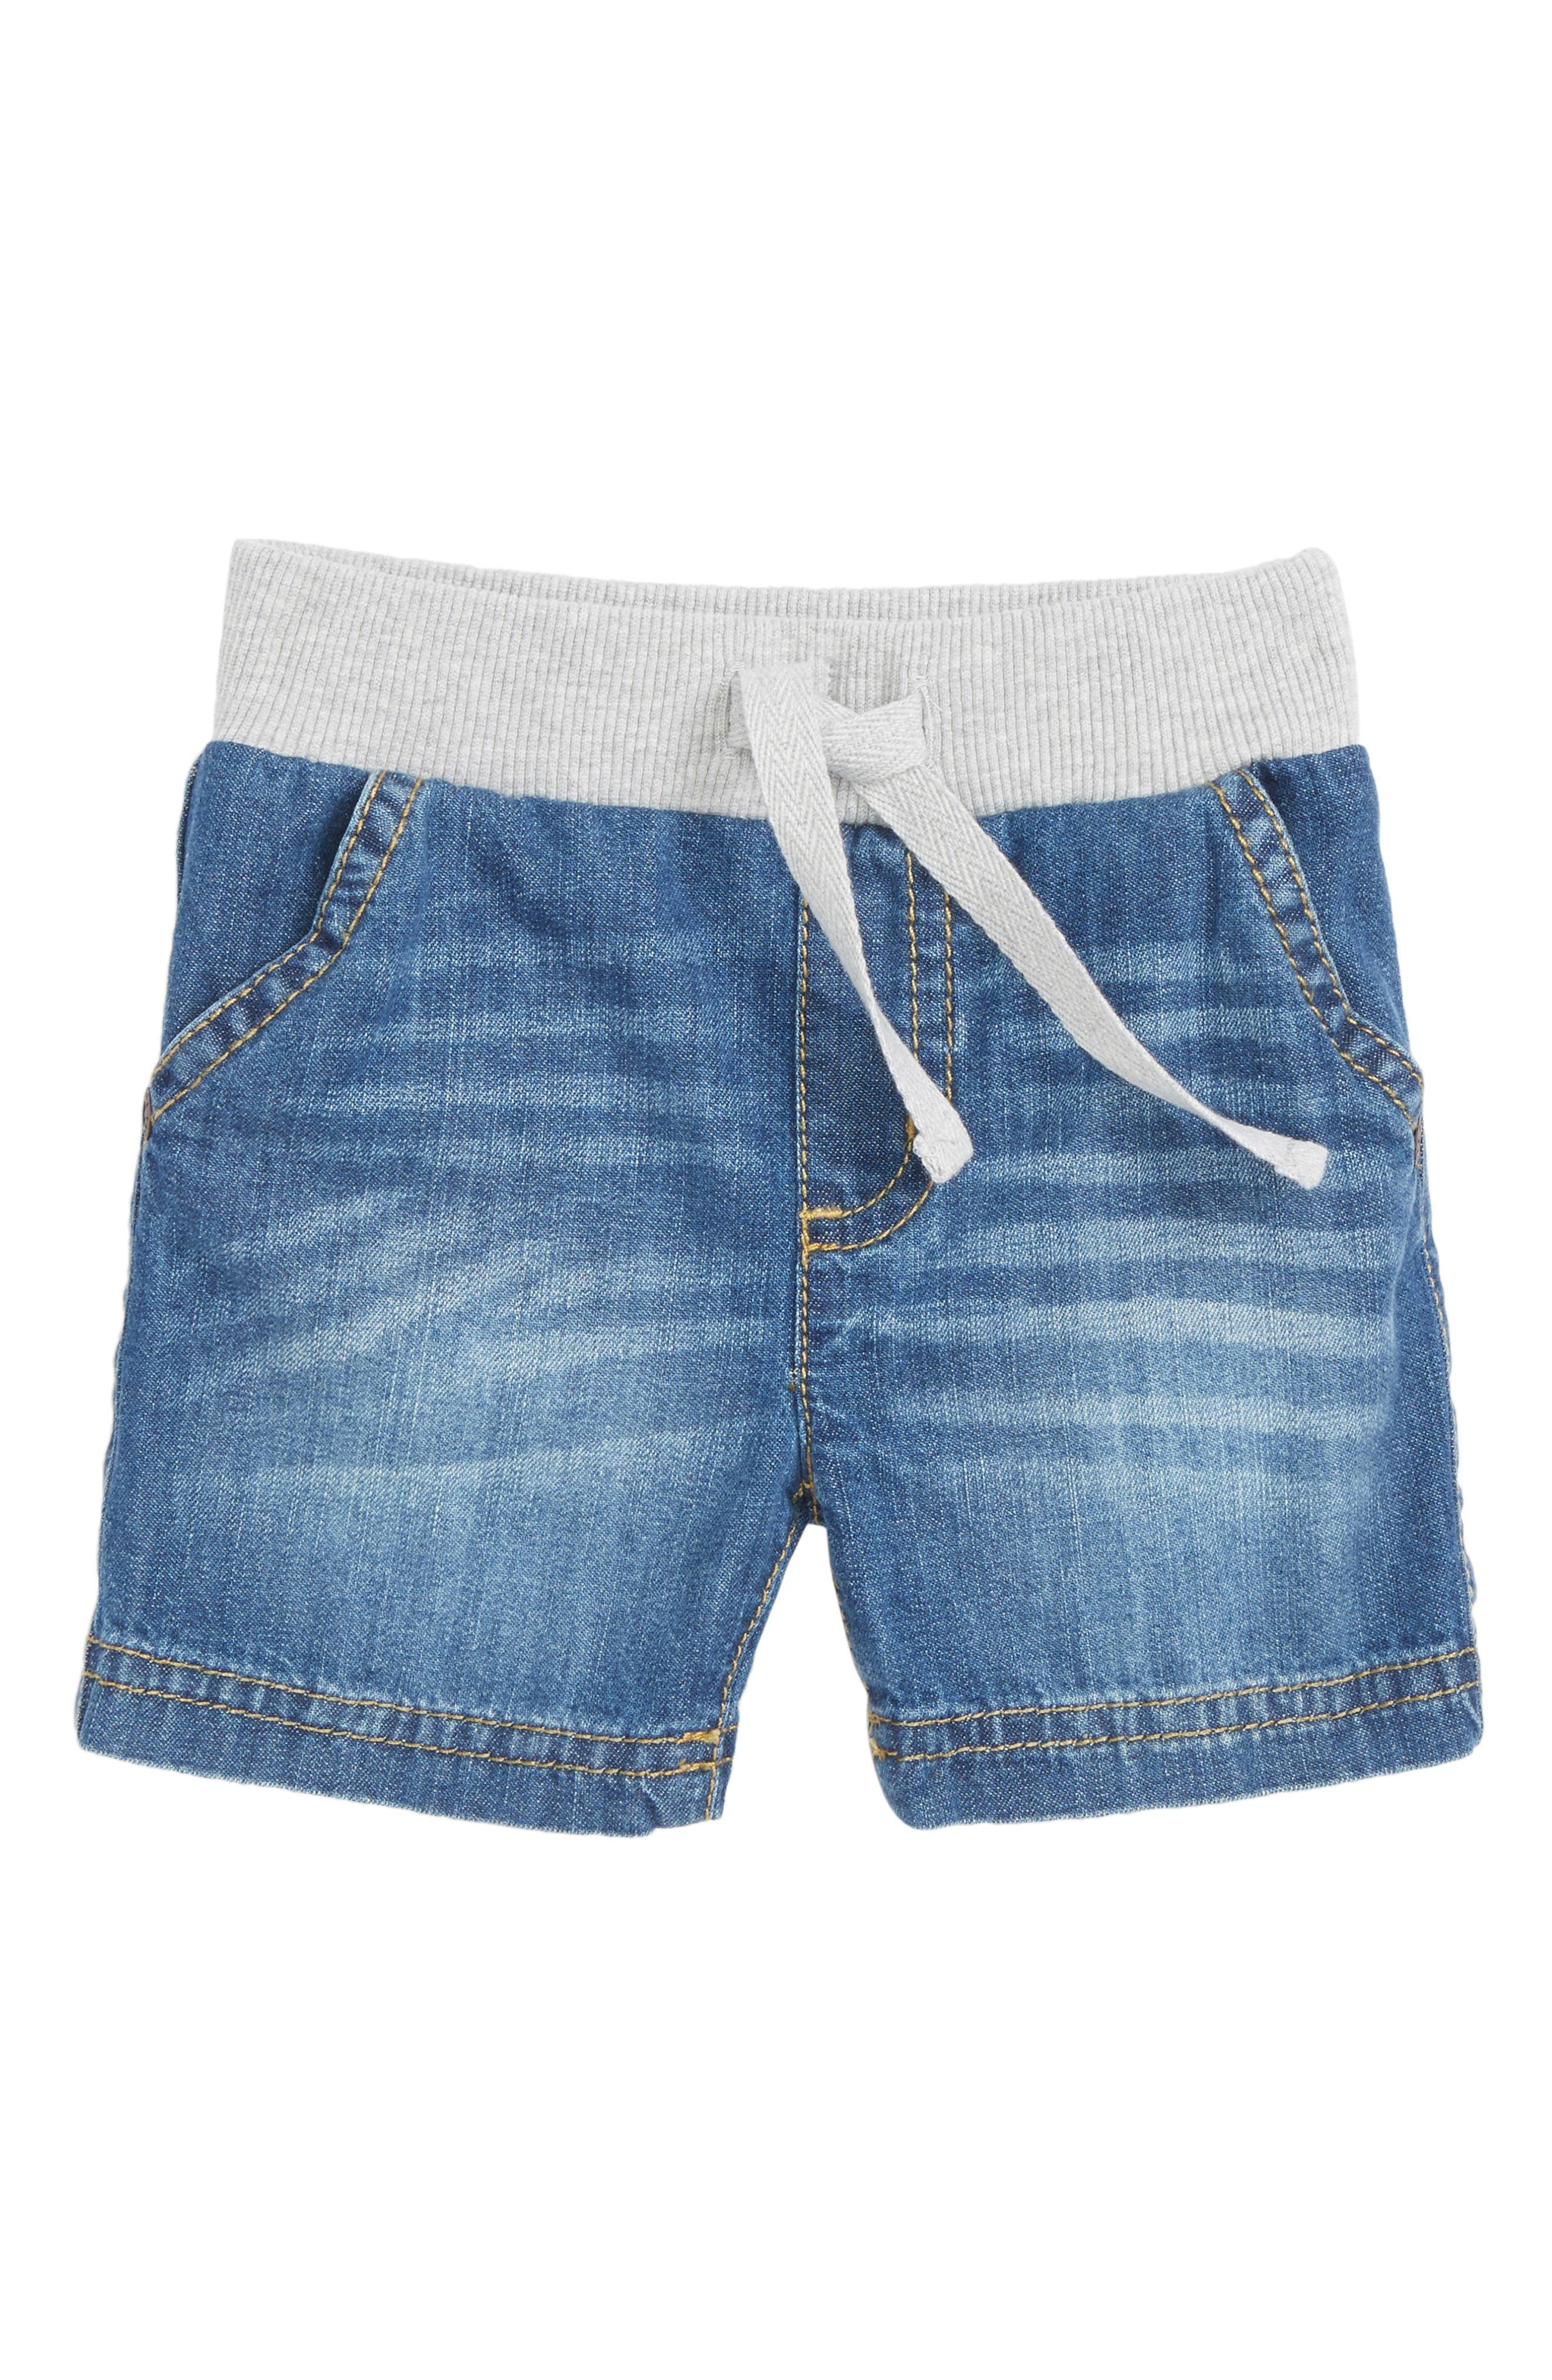 Woven Cotton Shorts,                             Main thumbnail 1, color,                             420